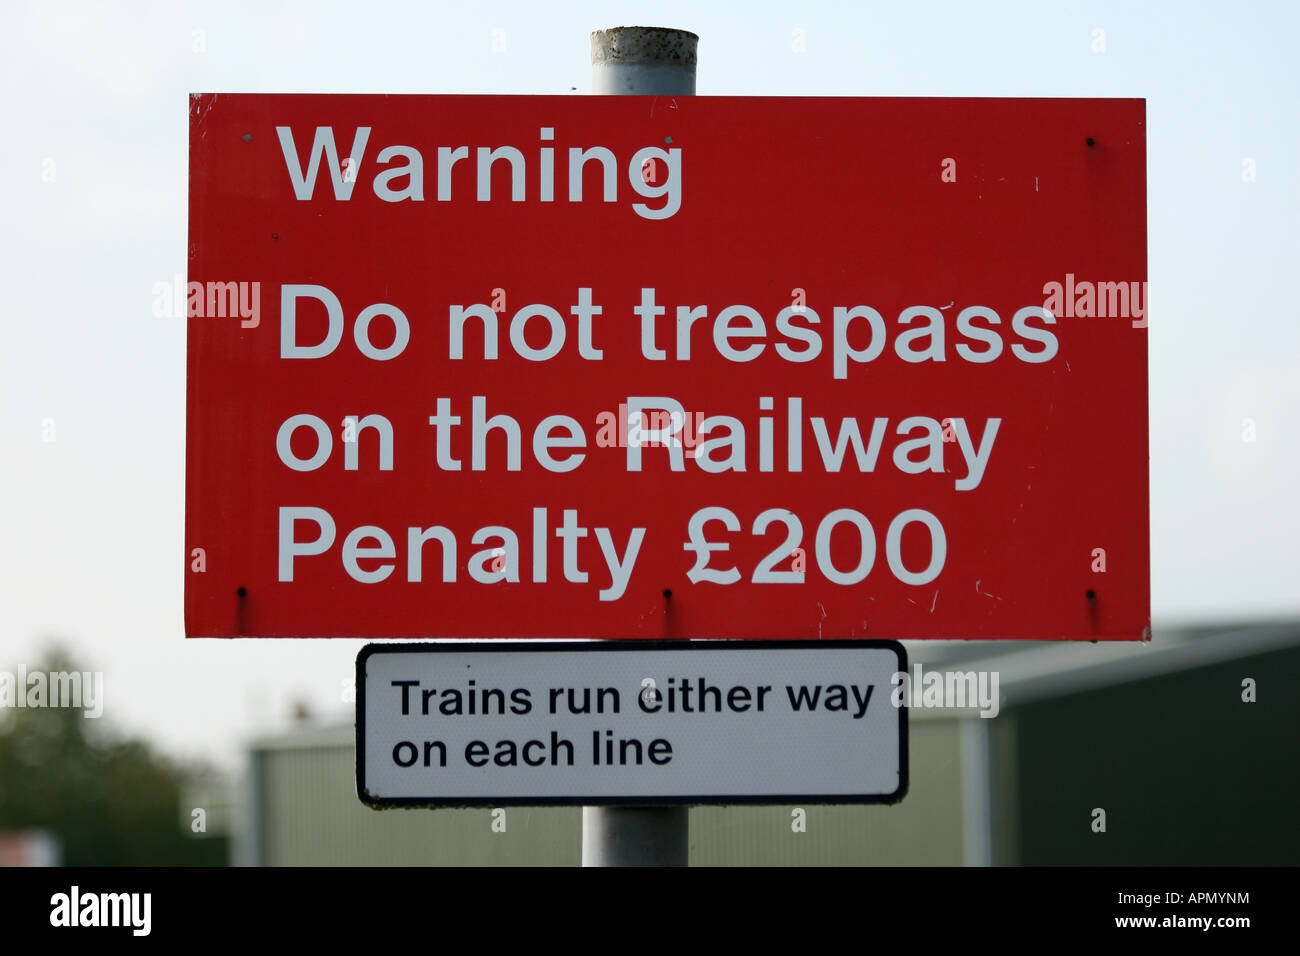 http://c8.alamy.com/comp/APMYNM/no-trespassing-sign-by-railway-APMYNM.jpg